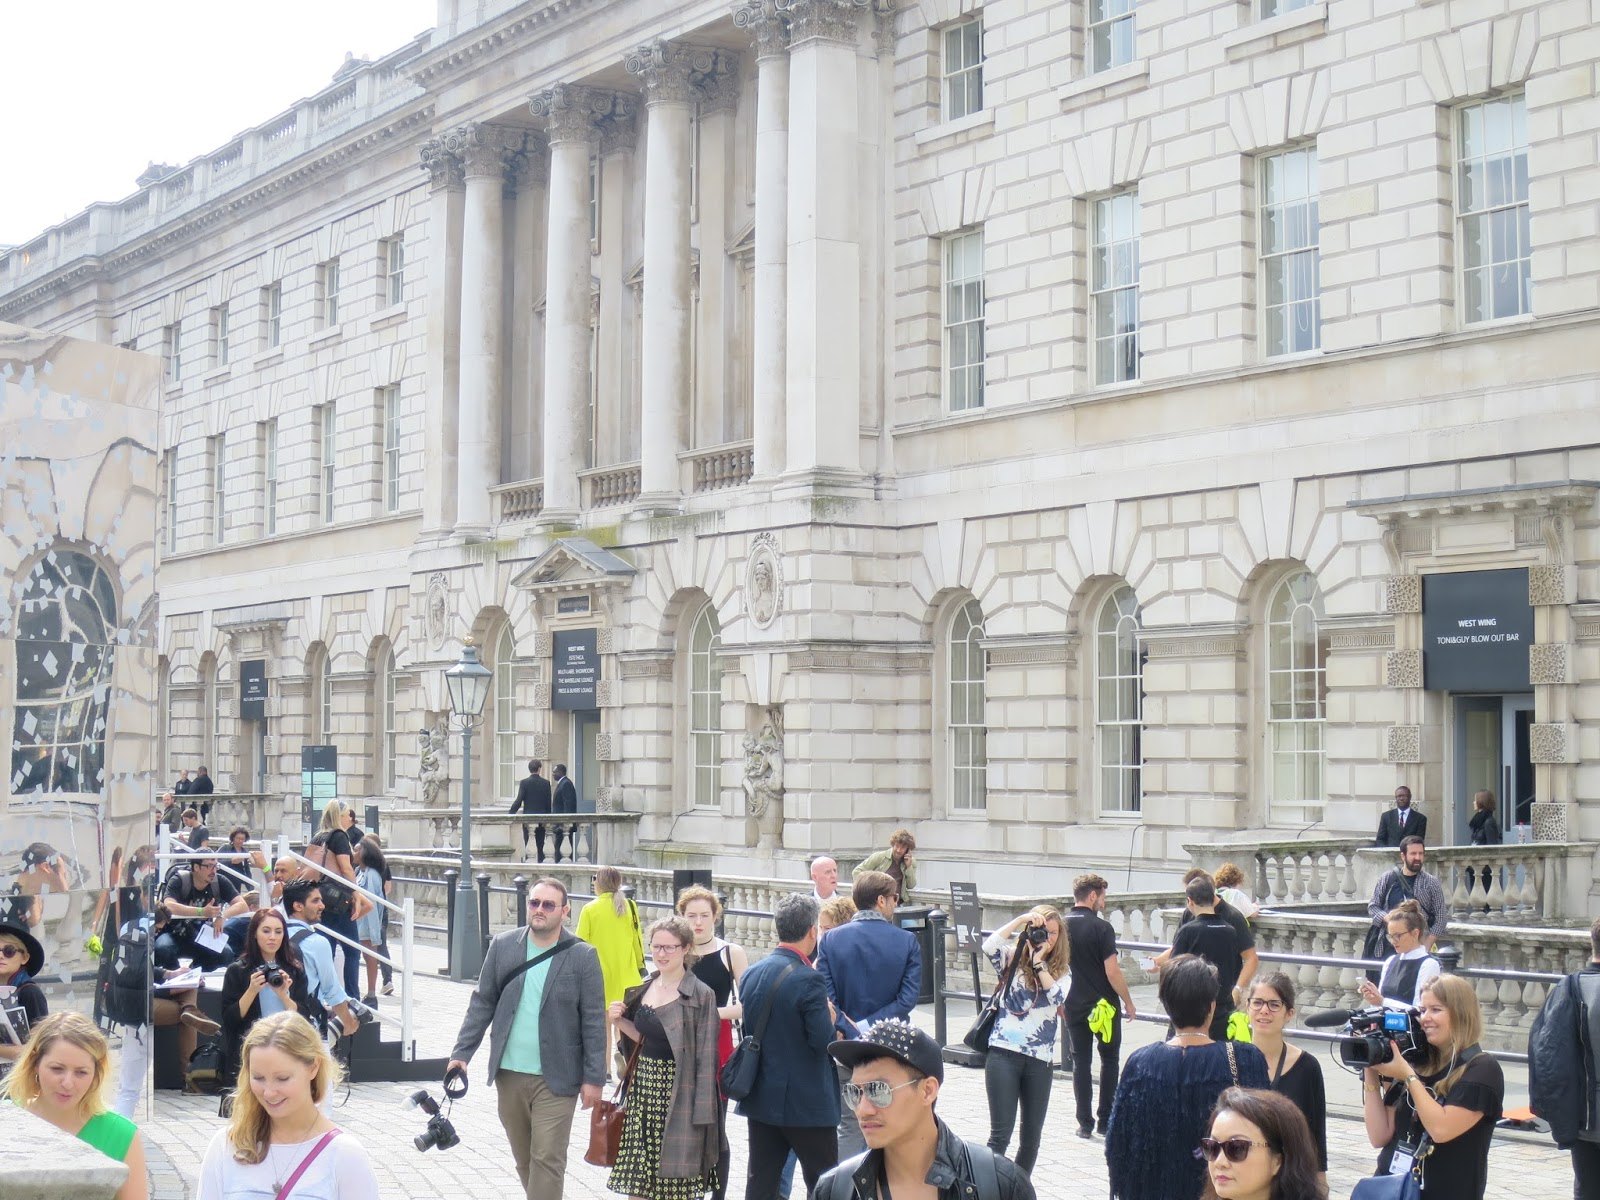 London Fashion Week SS15 - somerset house crowd